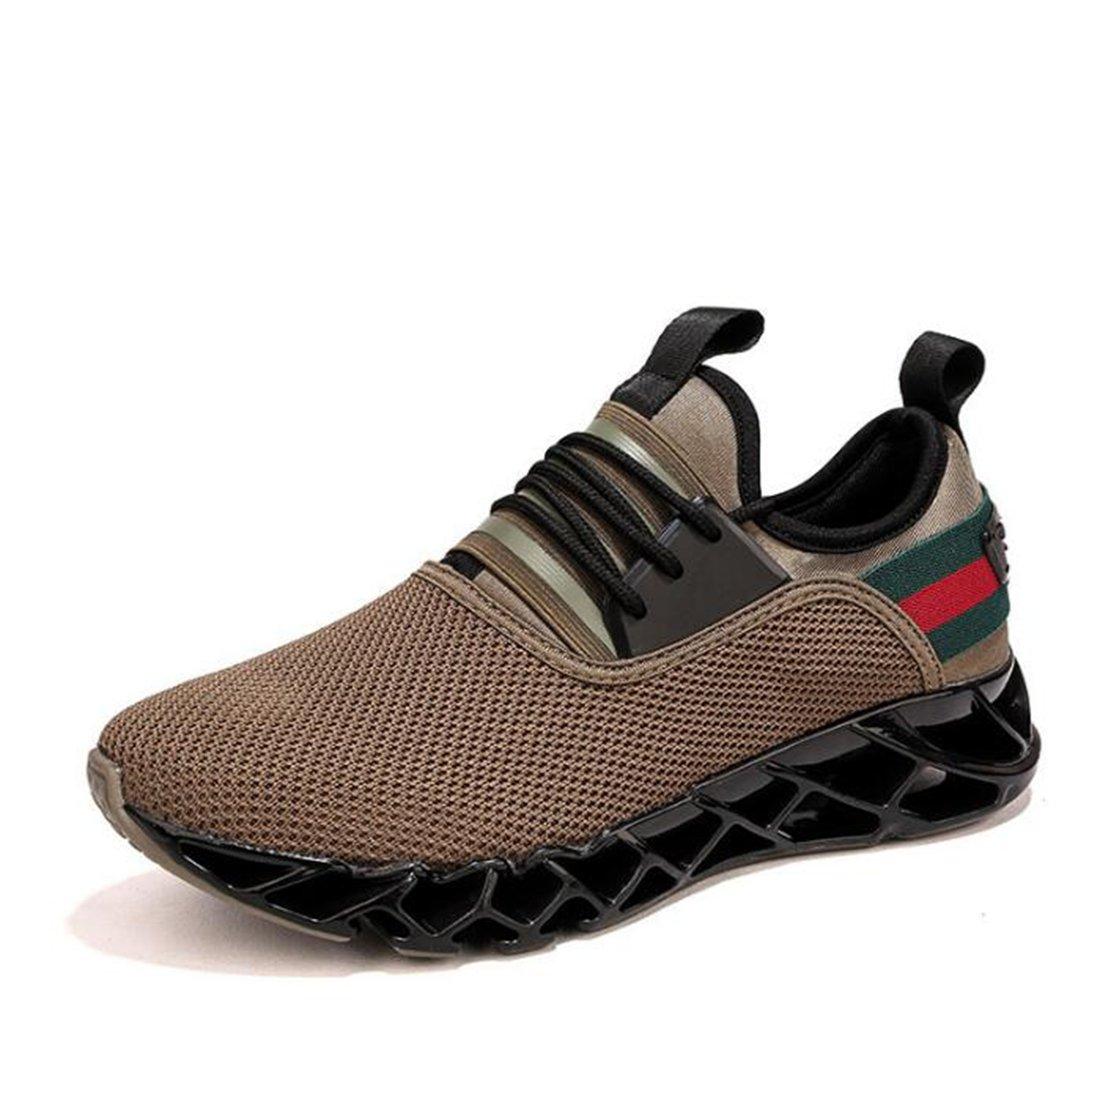 Zapatillas Deportivas Transpirables De Malla para Hombre 44 EU Brown